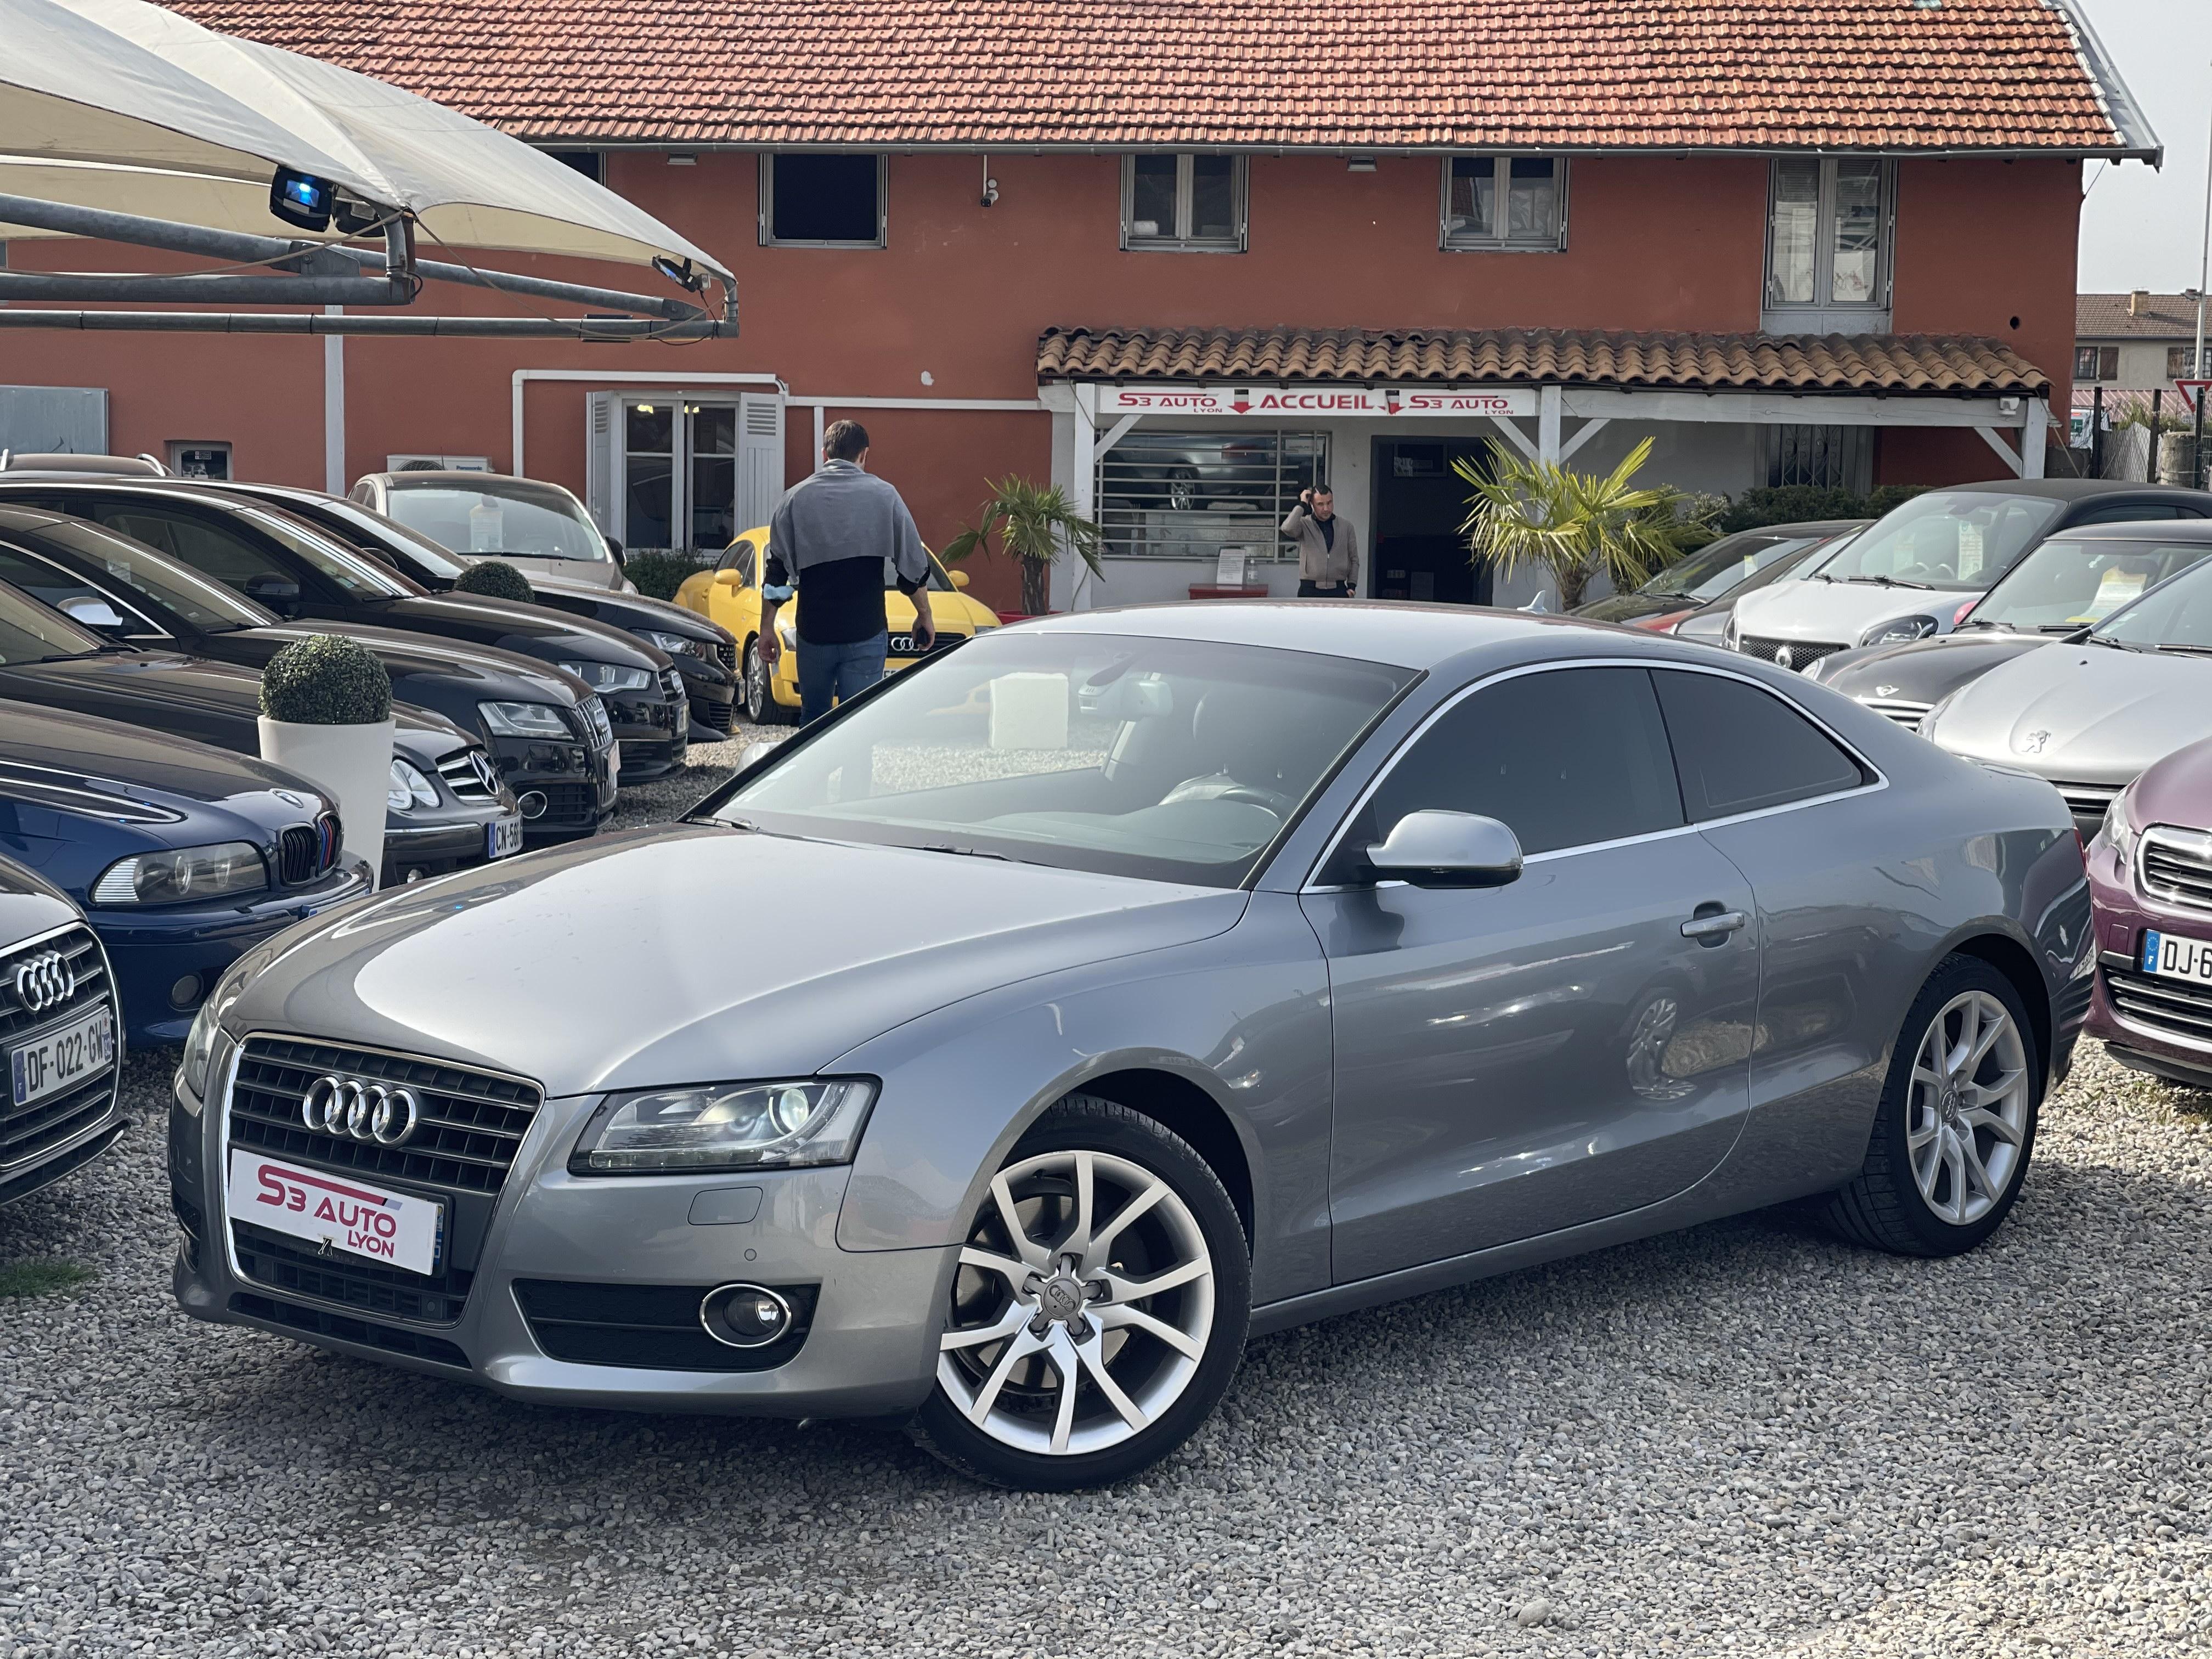 Audi A5 2 7 V6 TDI 190 Ambition Luxe Multitronic